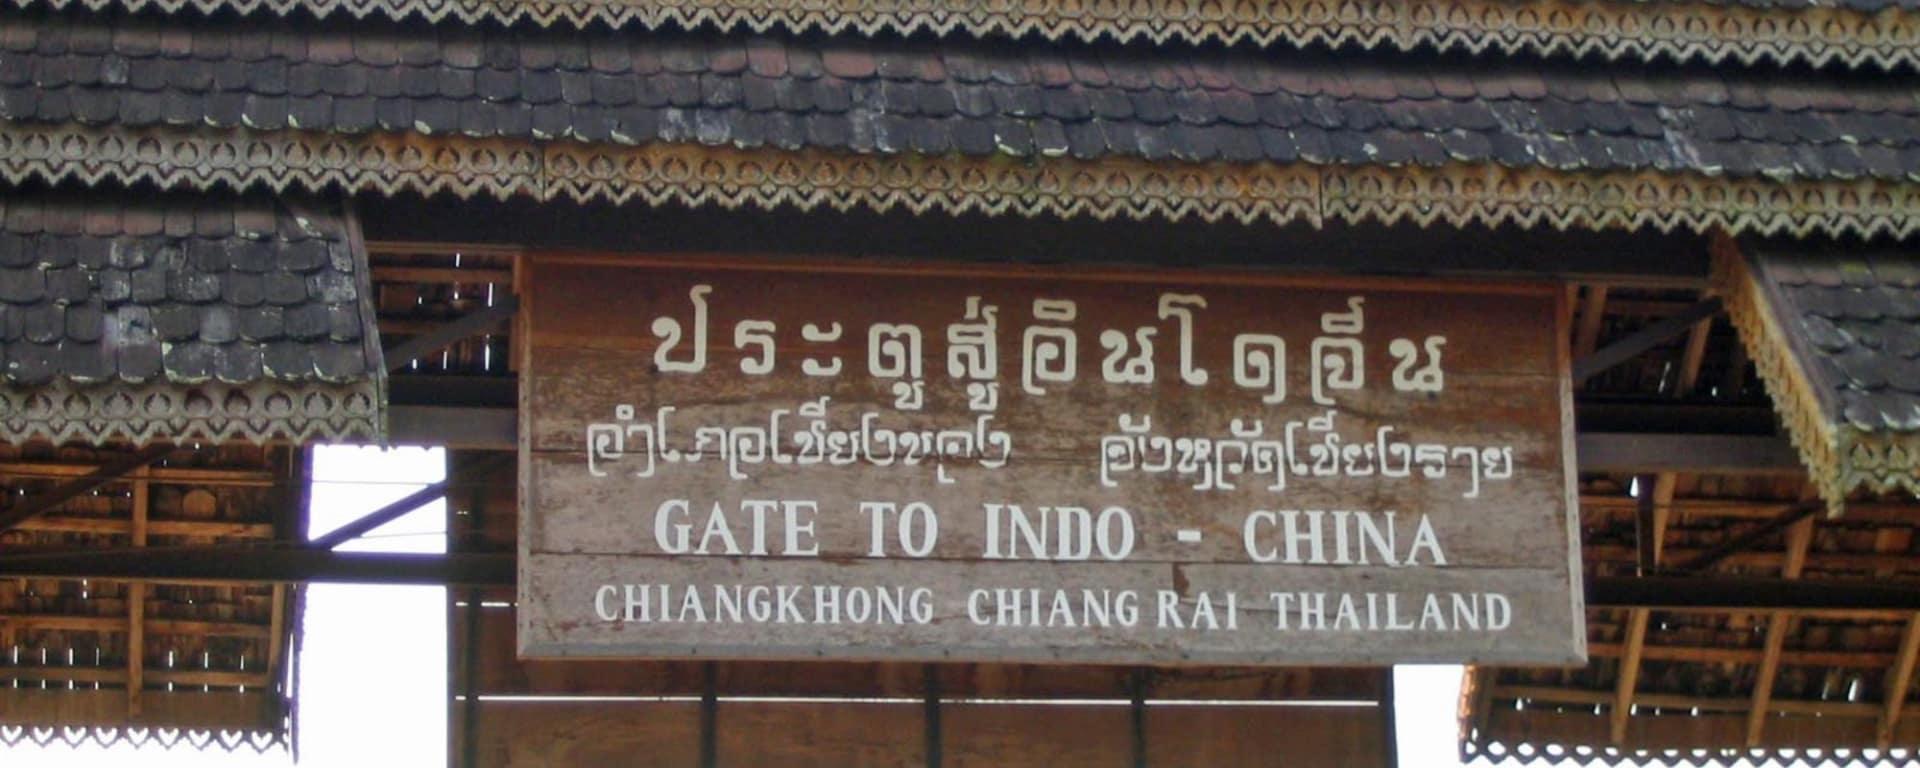 Au fil du Mékong cap sur Luang Prabang de Chiang Mai: Chiang Khong: Border Thailand Laos